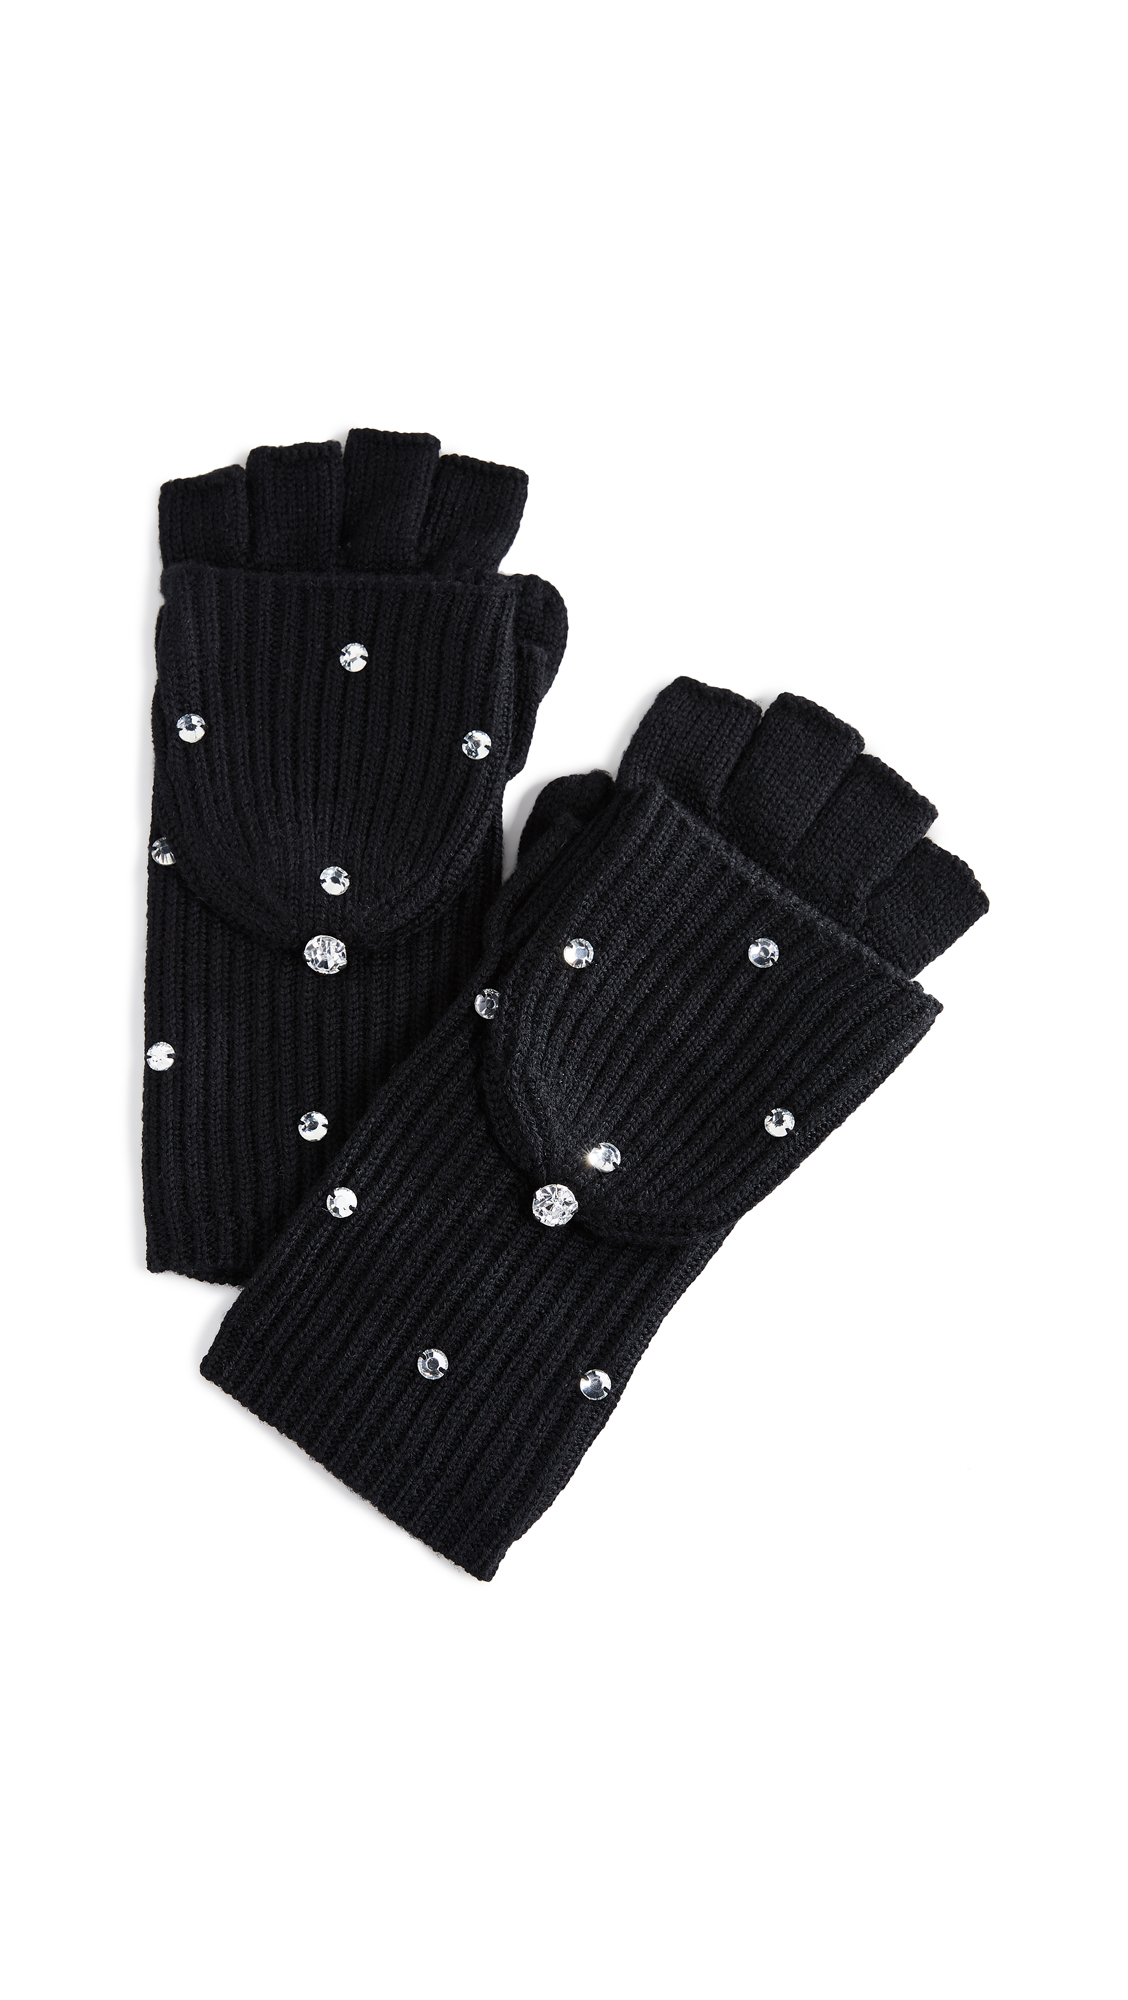 Kate Spade New York Bedazzled Pop Top Gloves In Black/Smoke